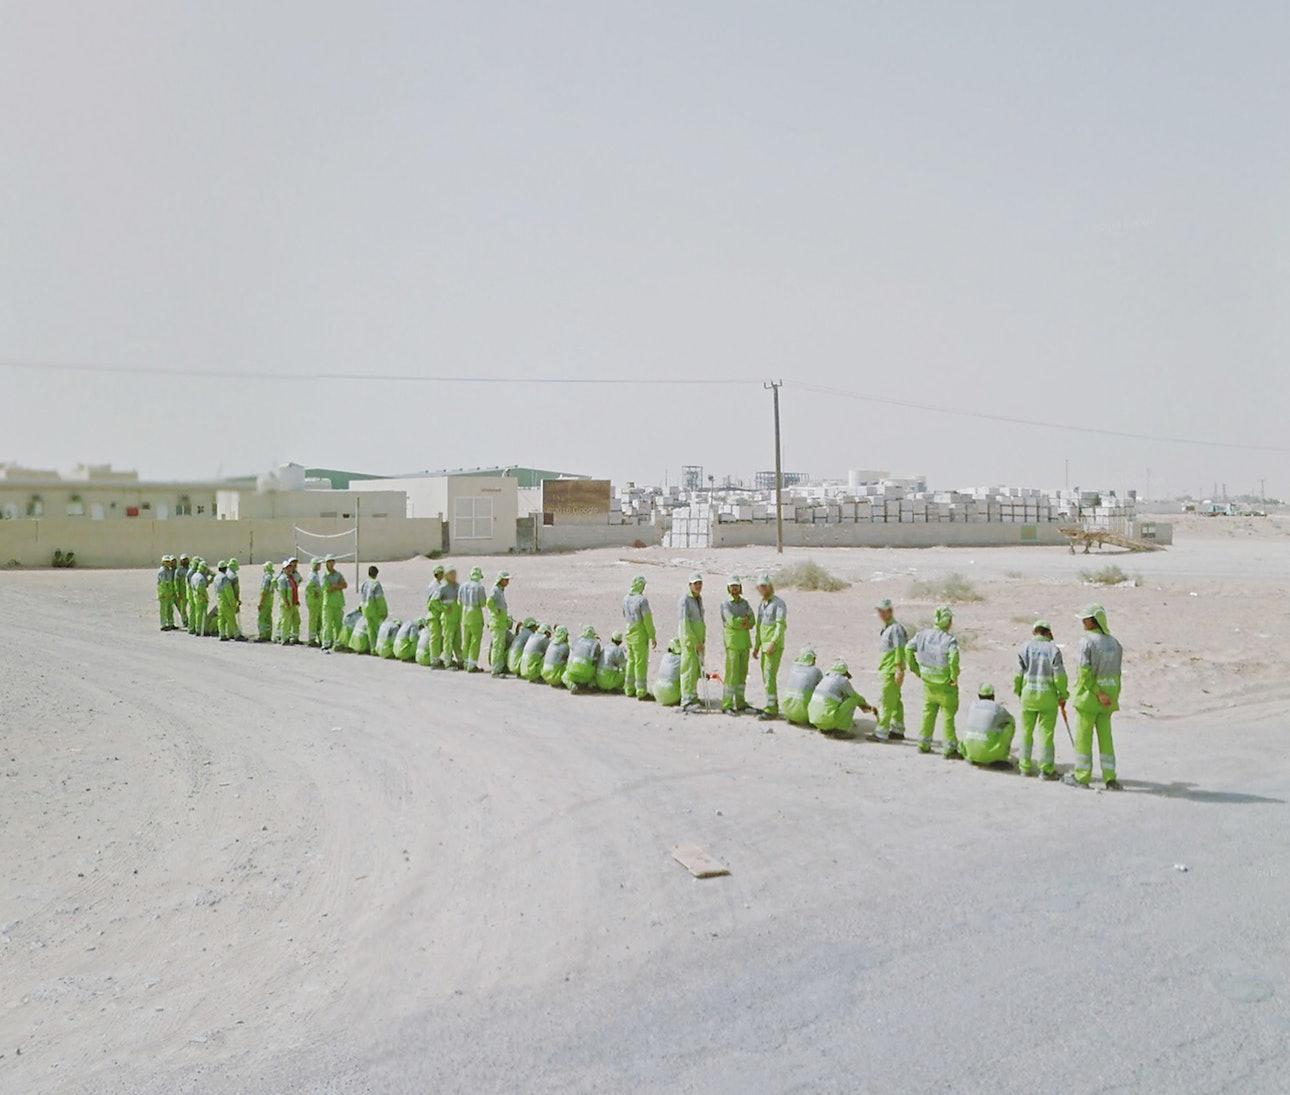 Greenmen_UAE_agoraphobia